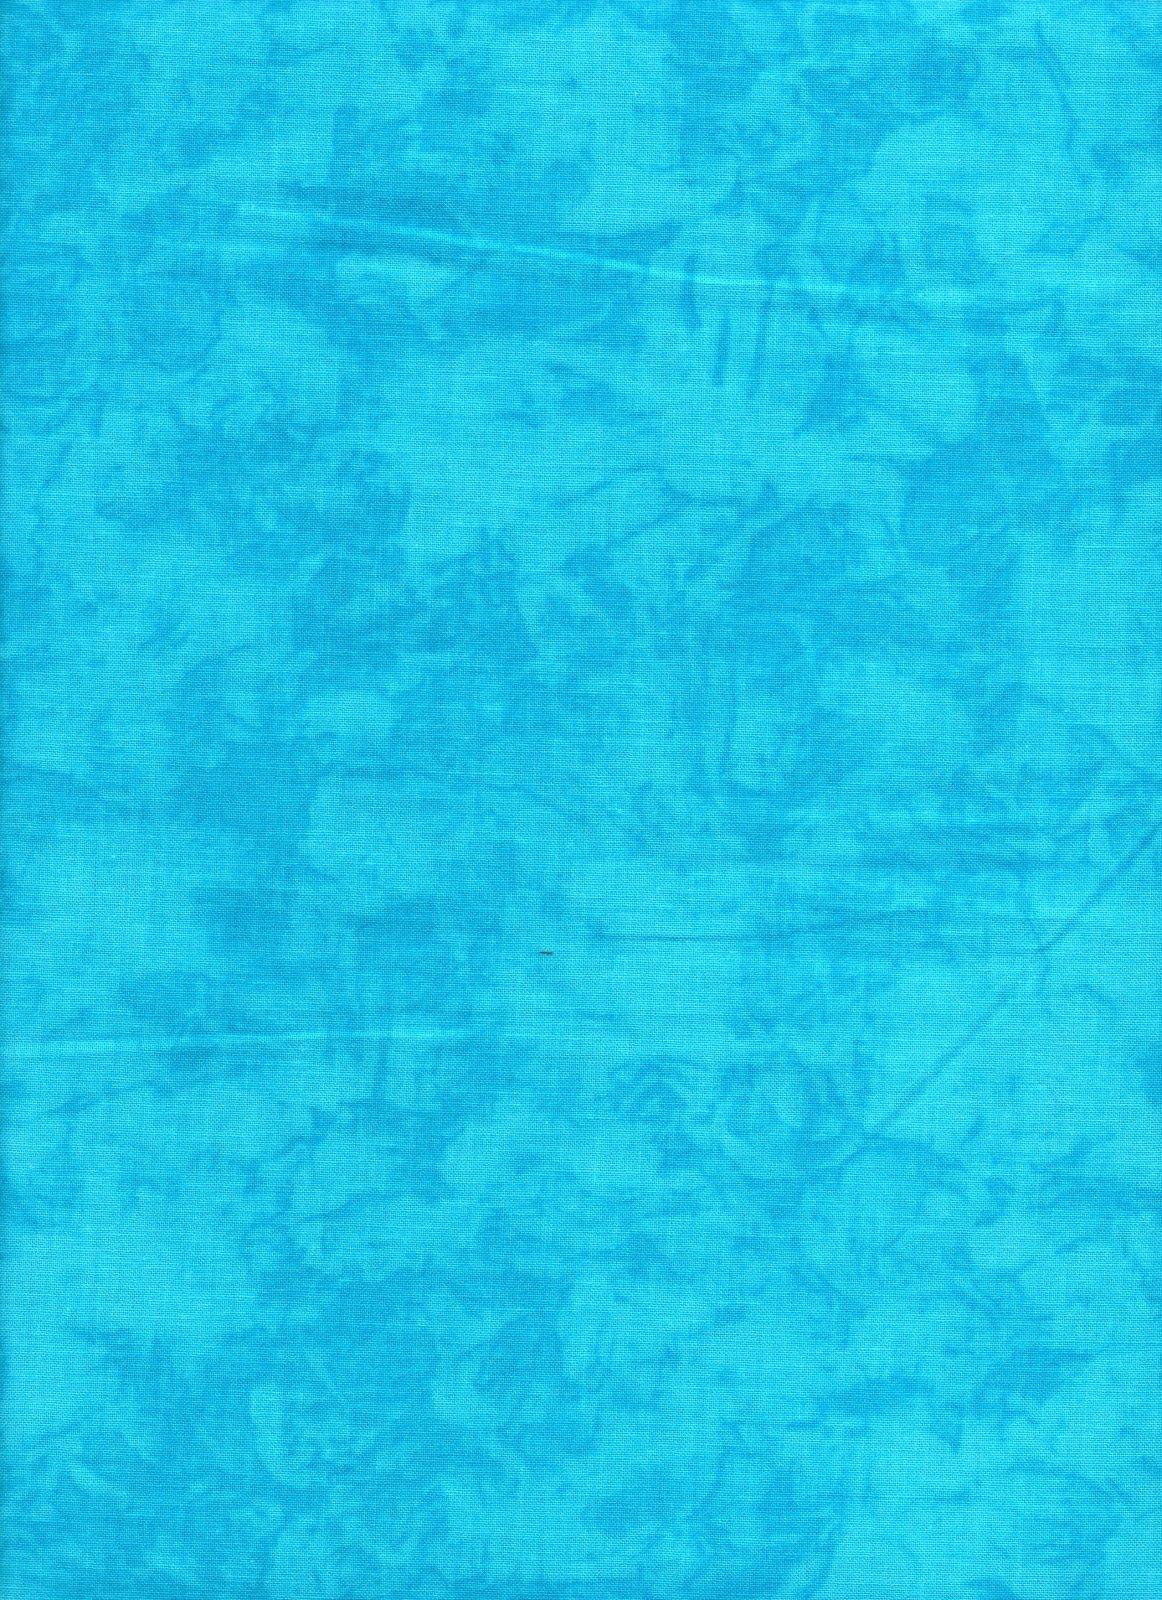 Michael Miller Krystal Turquoise